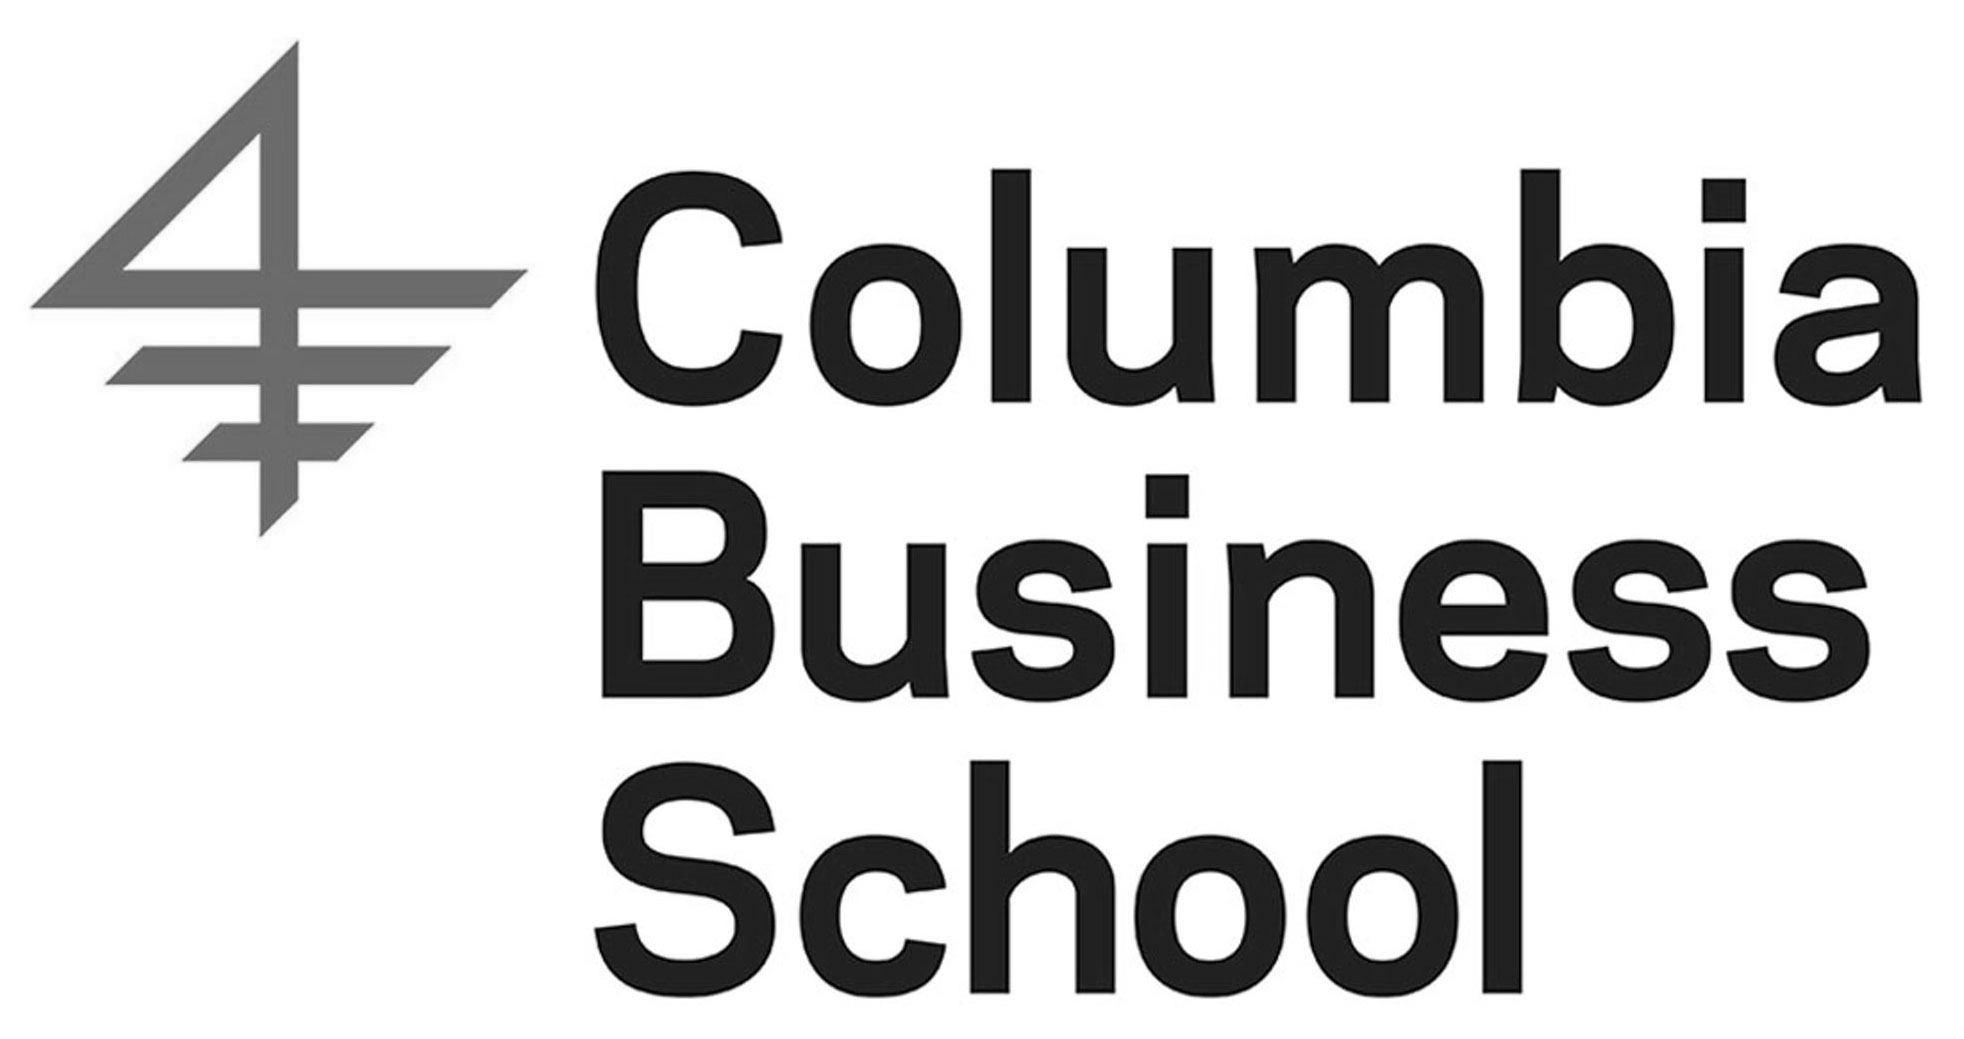 image of columbia business school logo 2